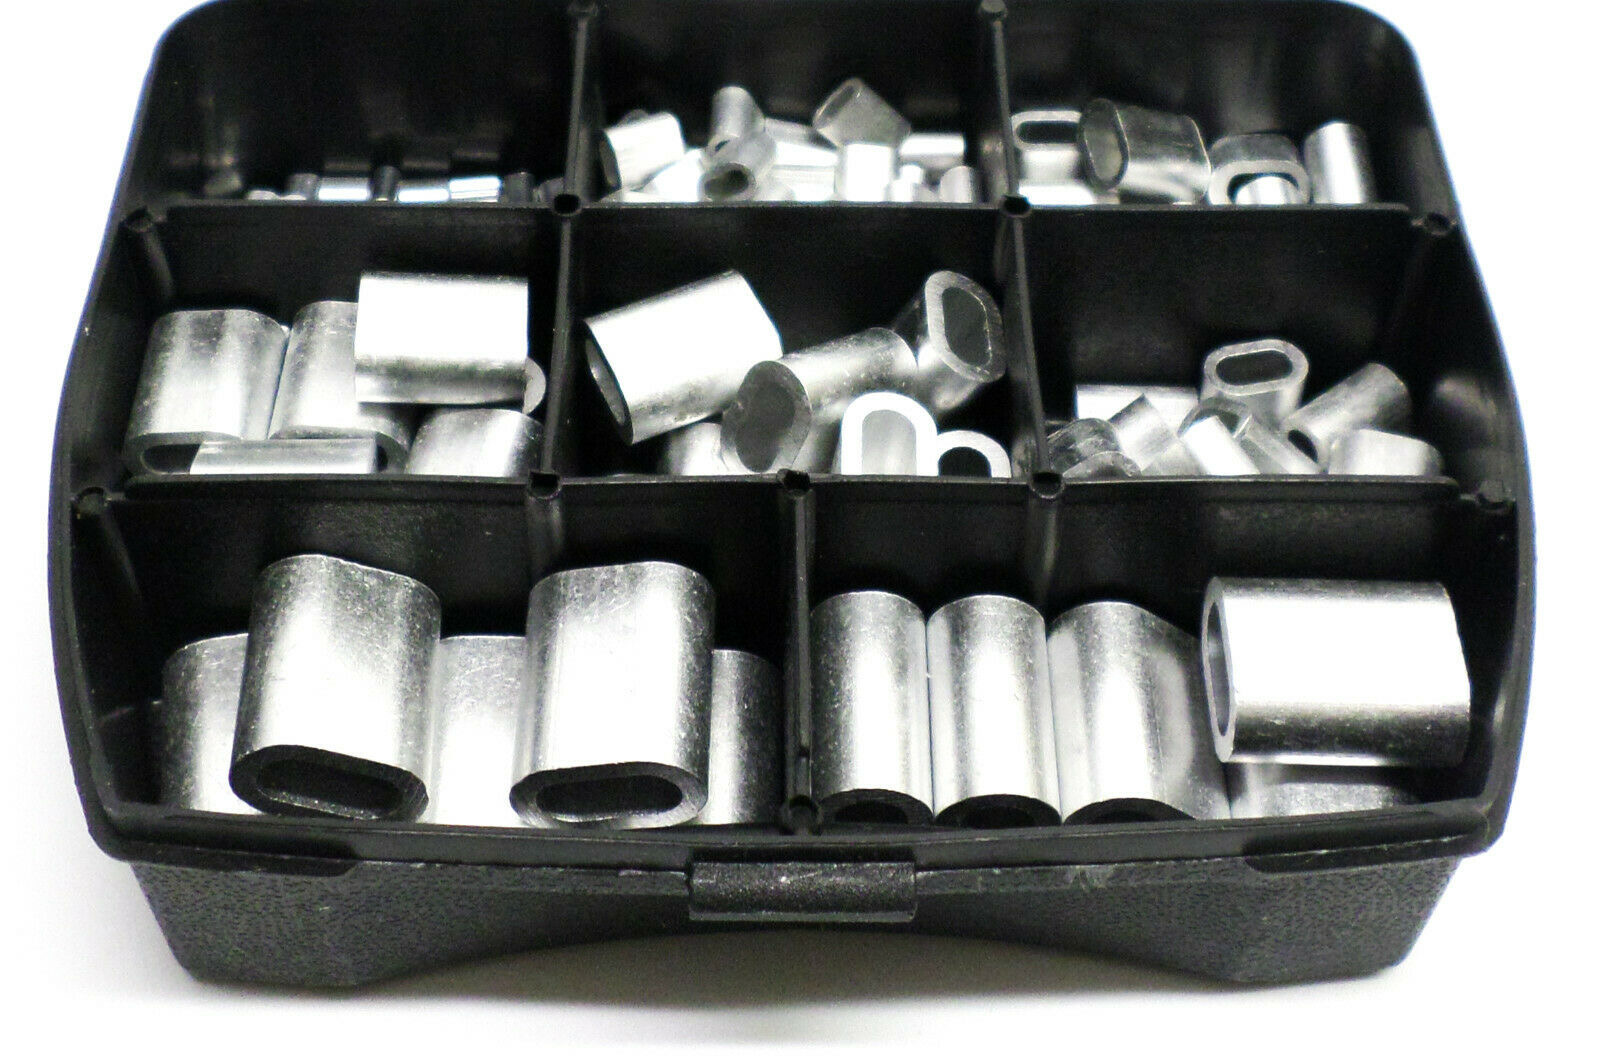 Klemkousen in assortimentsbox